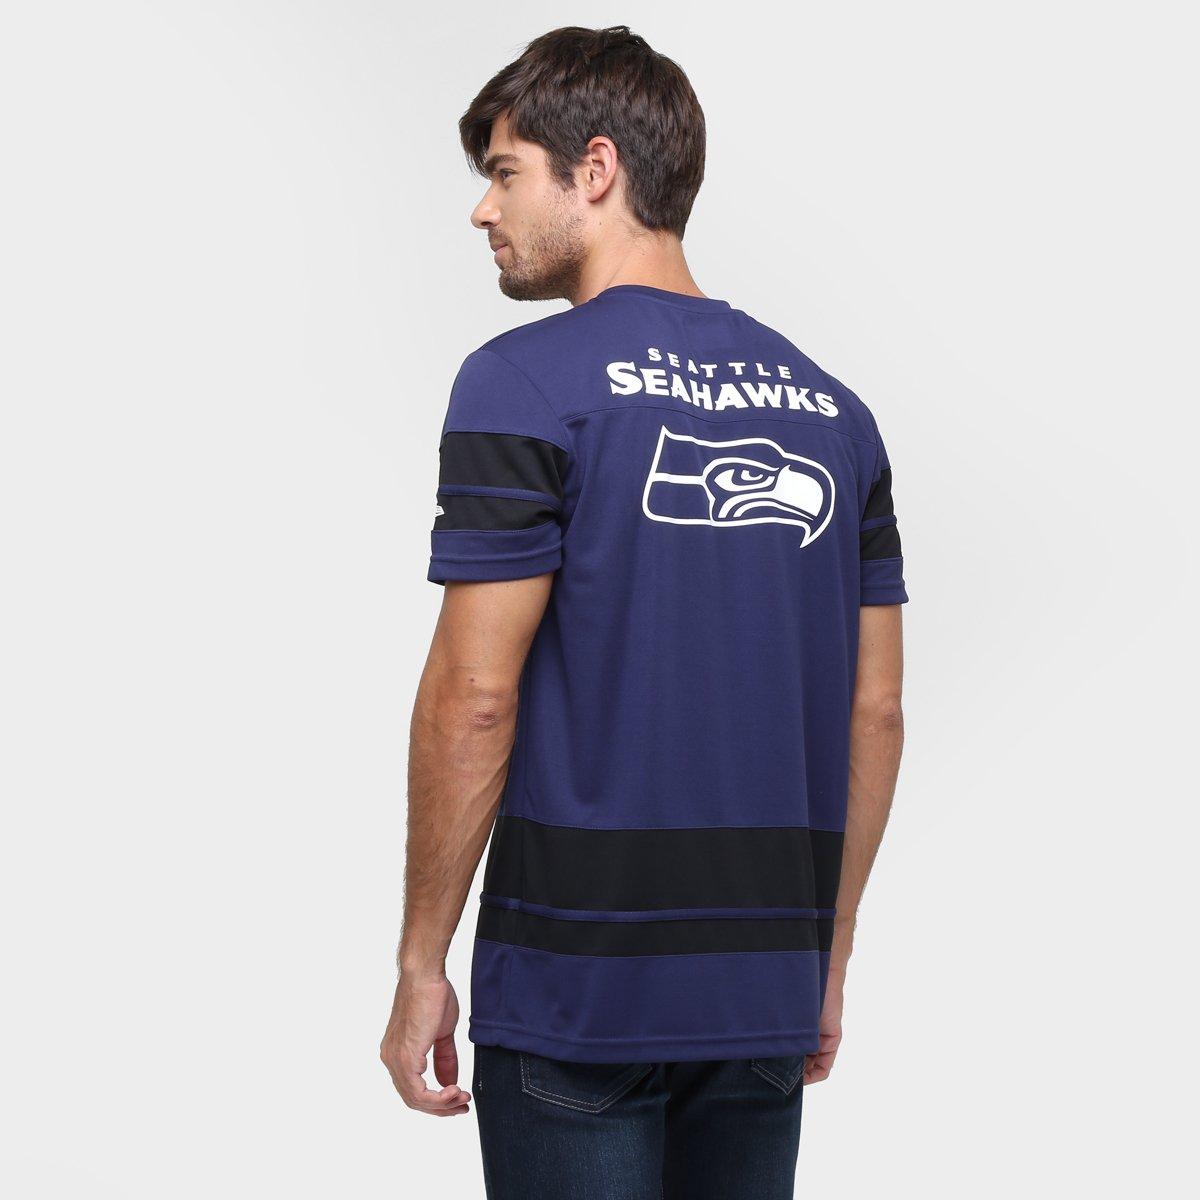 4f227e77f Camiseta New Era NFL Jersey Seattle Seahawks - Compre Agora